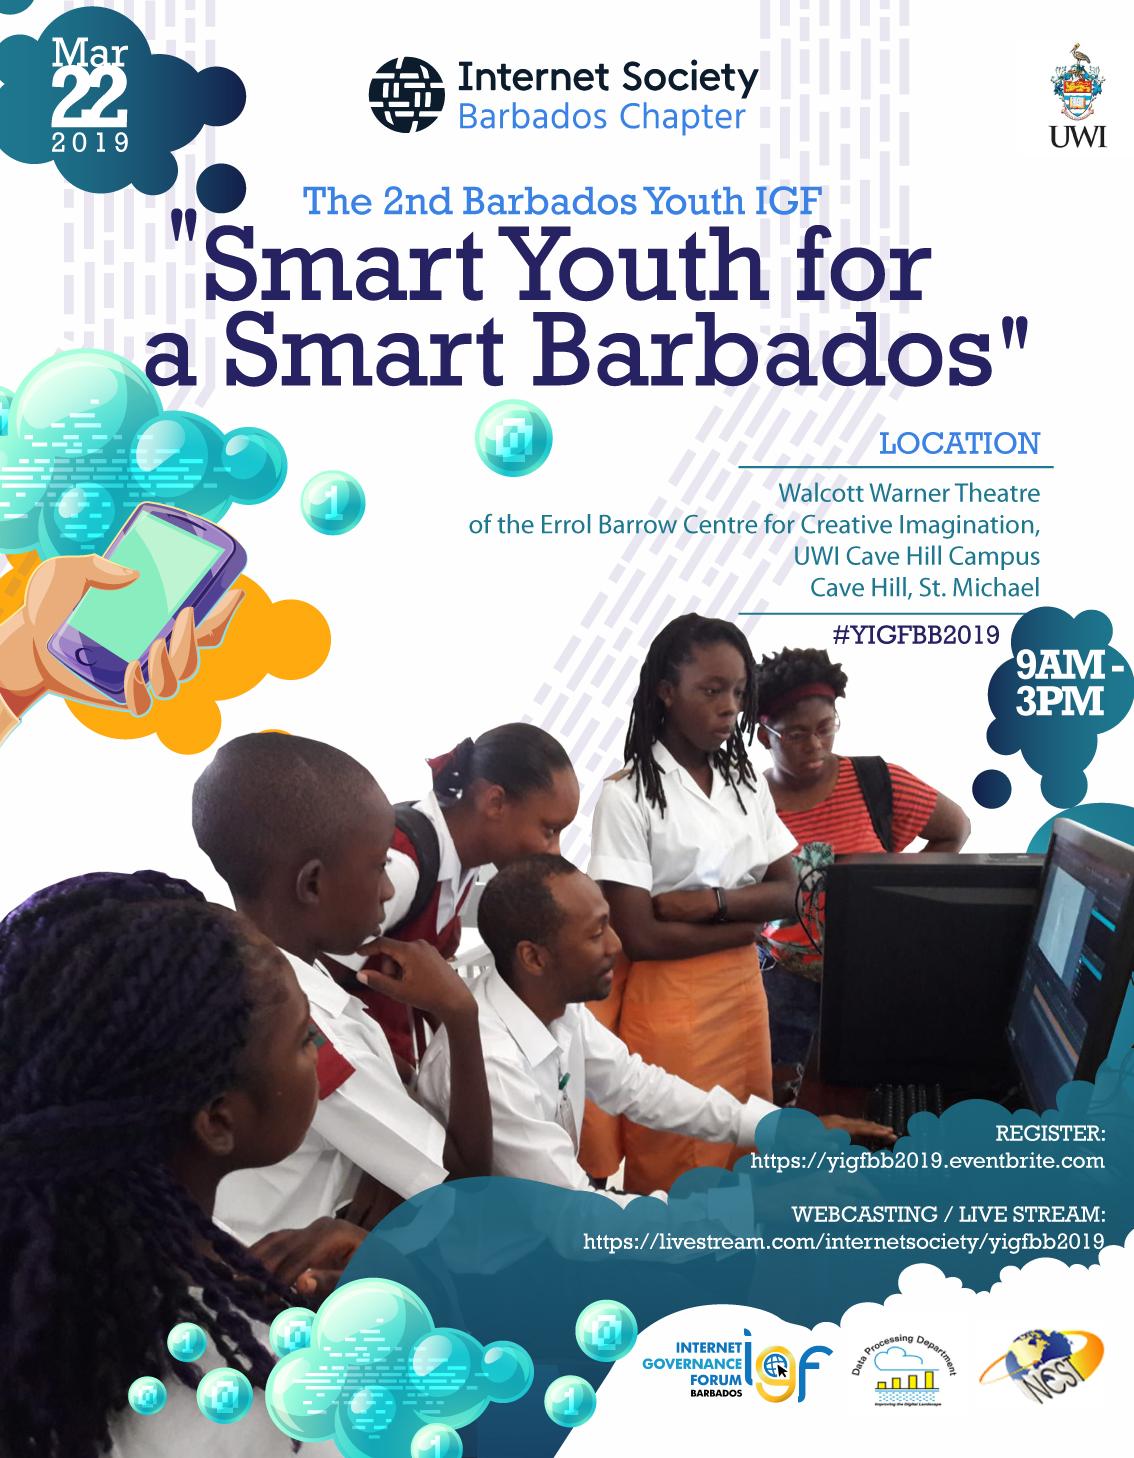 Youth IGF Barbados 2019 Poster